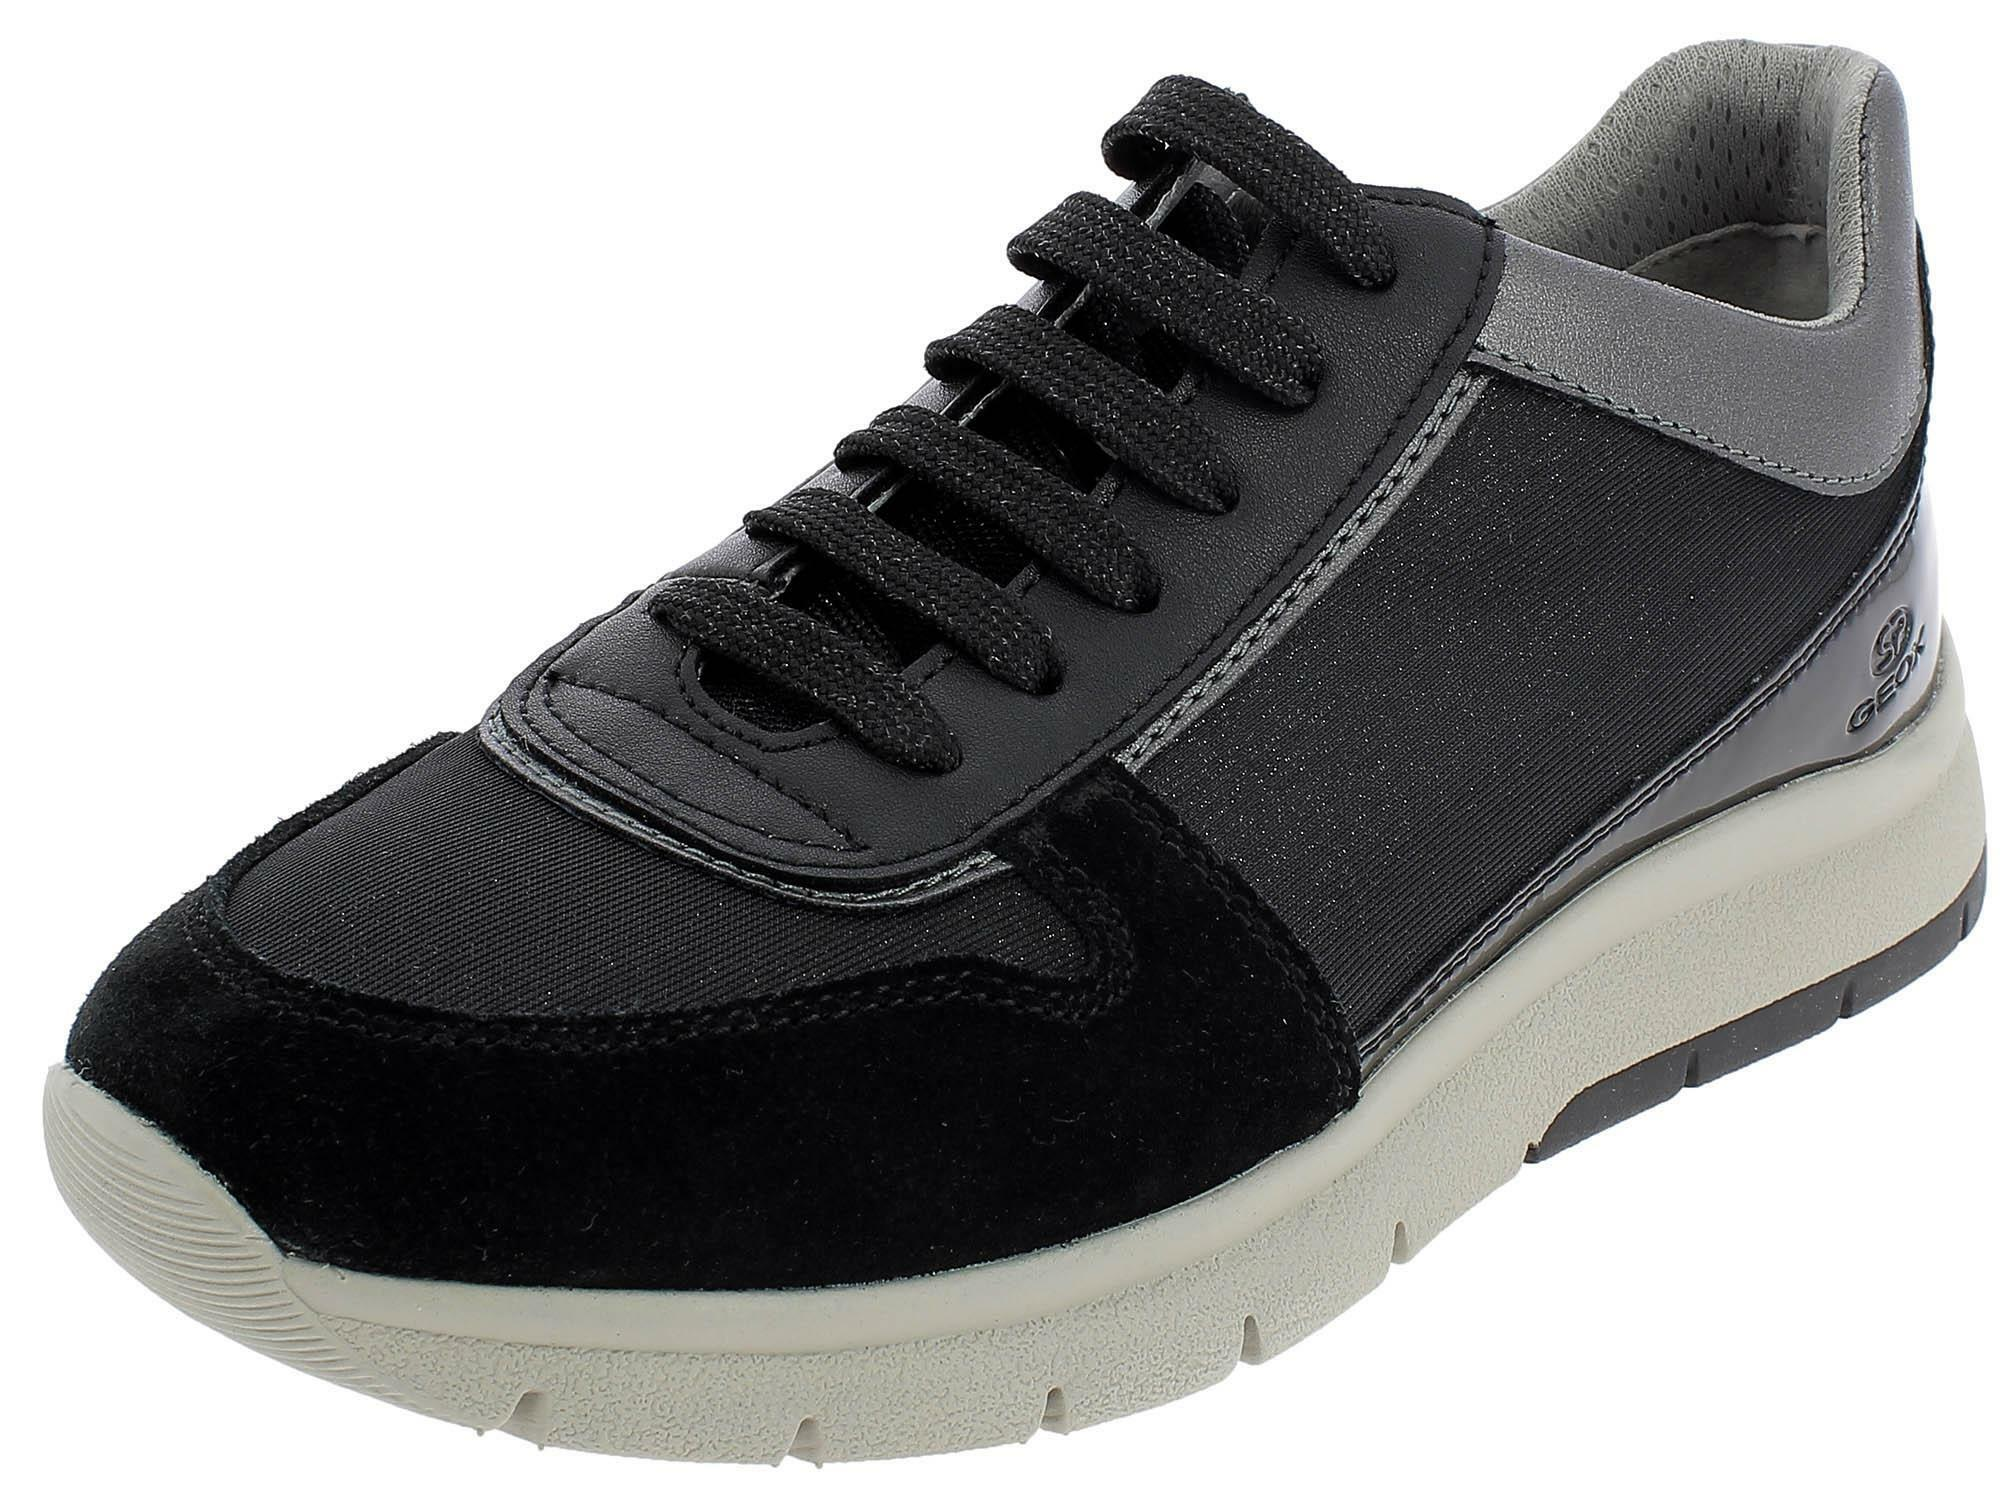 geox d callyn d scarpe donna nere d849gdc9999